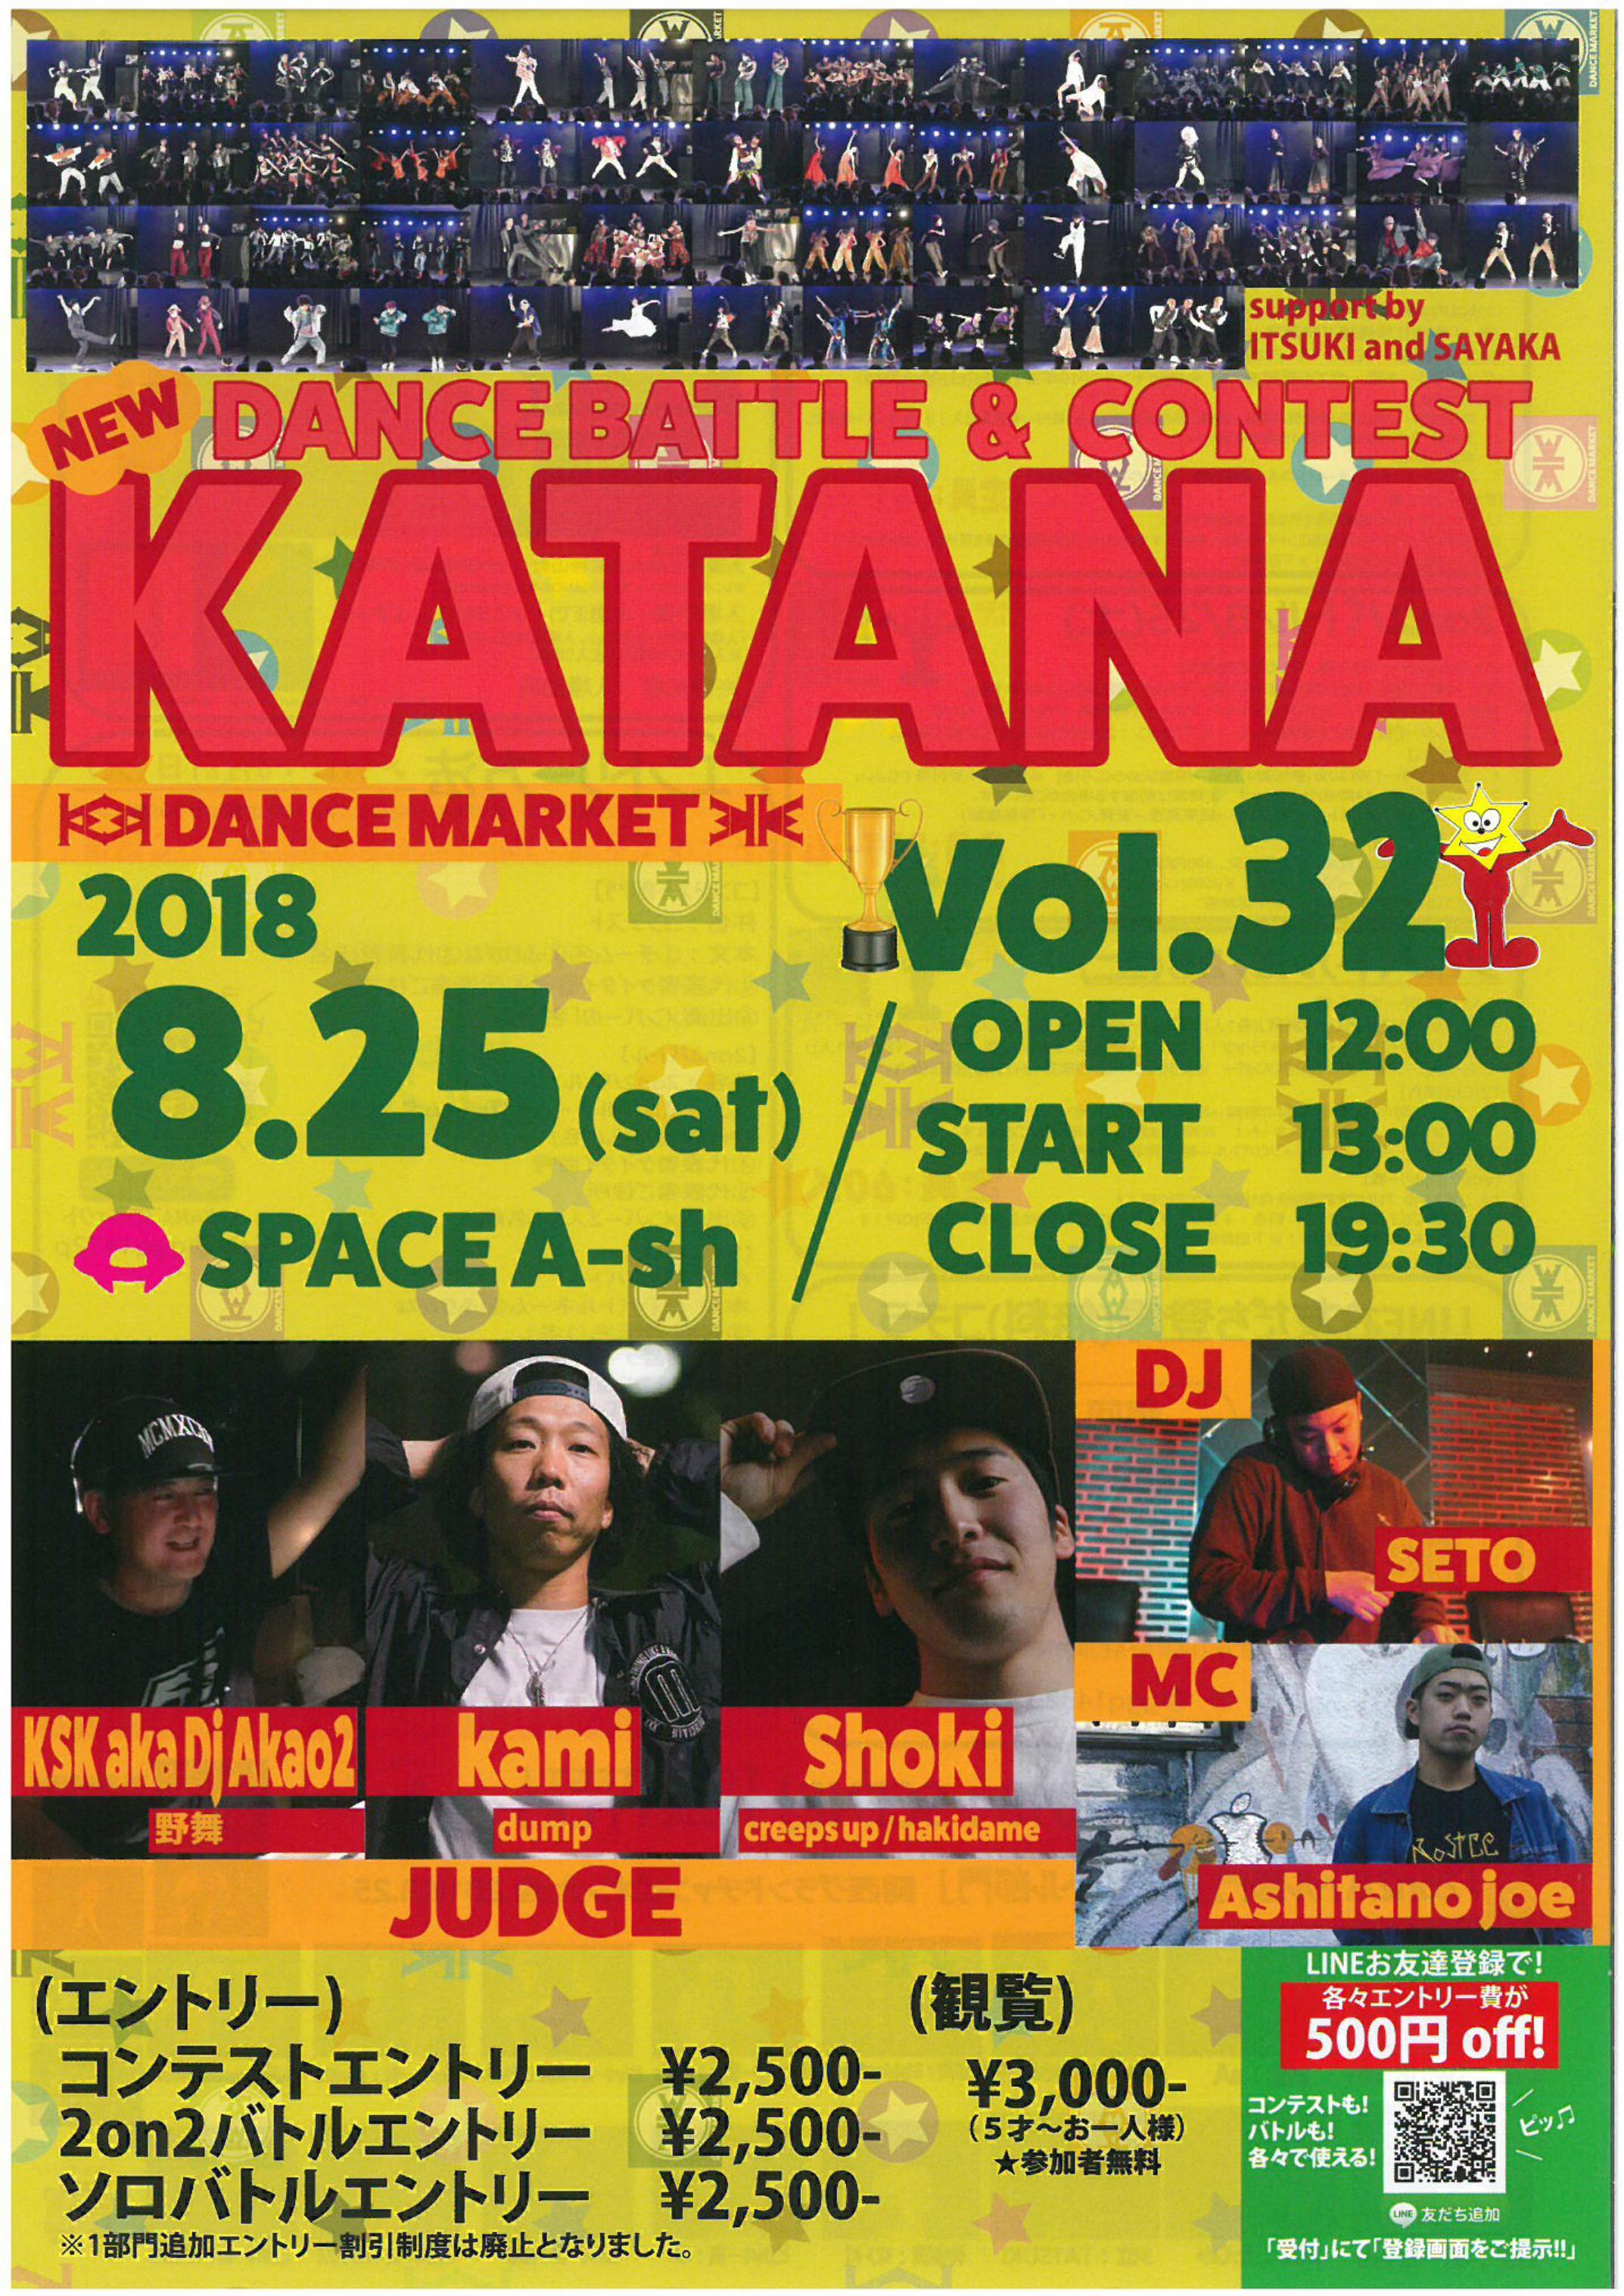 KATANA DANCE MARKET VOL.32